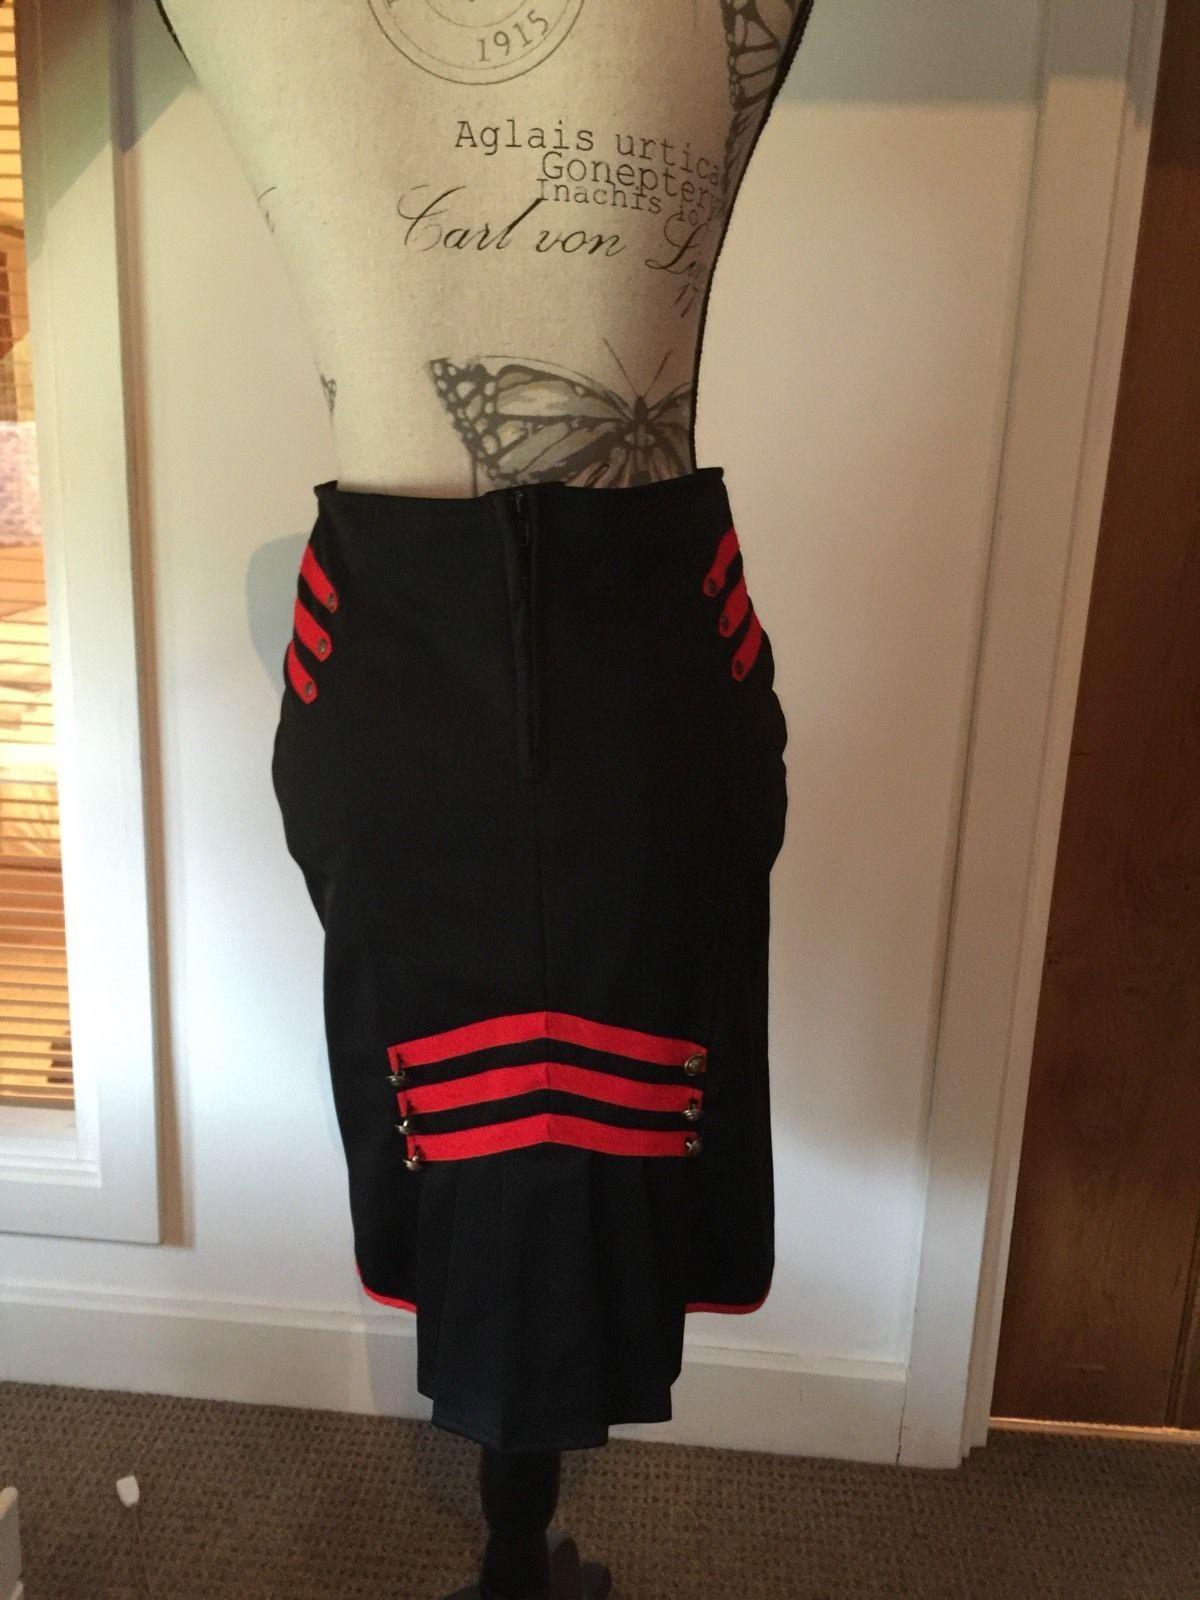 http://www.ebay.co.uk/itm/Hell-Bunny-Black-Red-Military-Pinup-Skirt ...